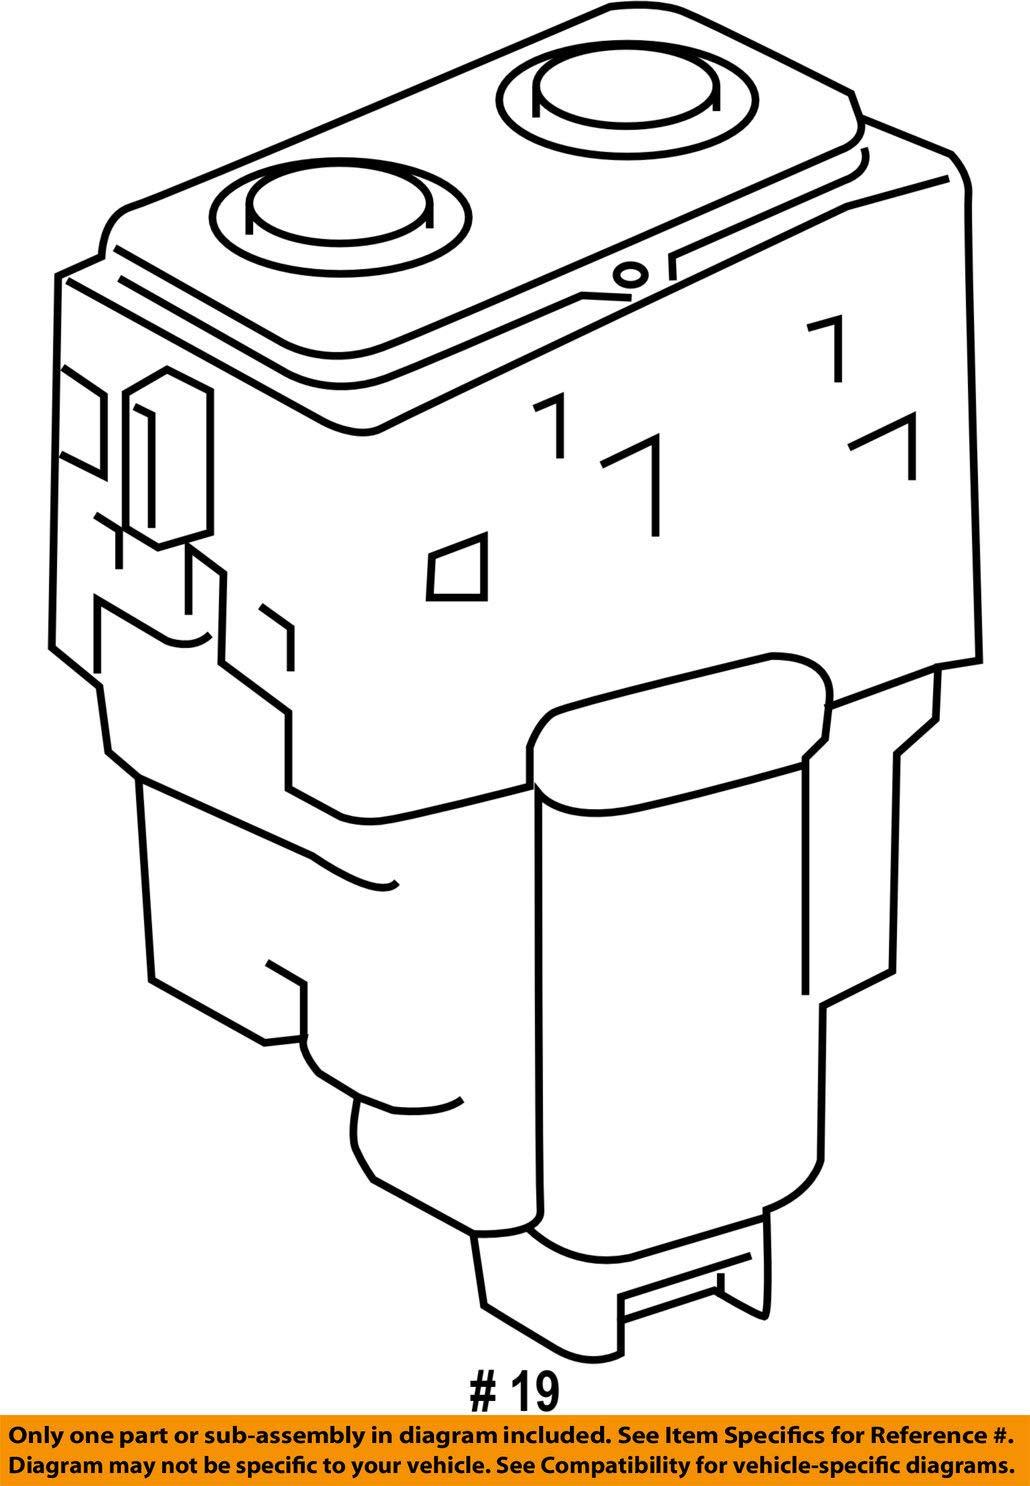 Toyota 84752-07010 Refreshing Seat Switch